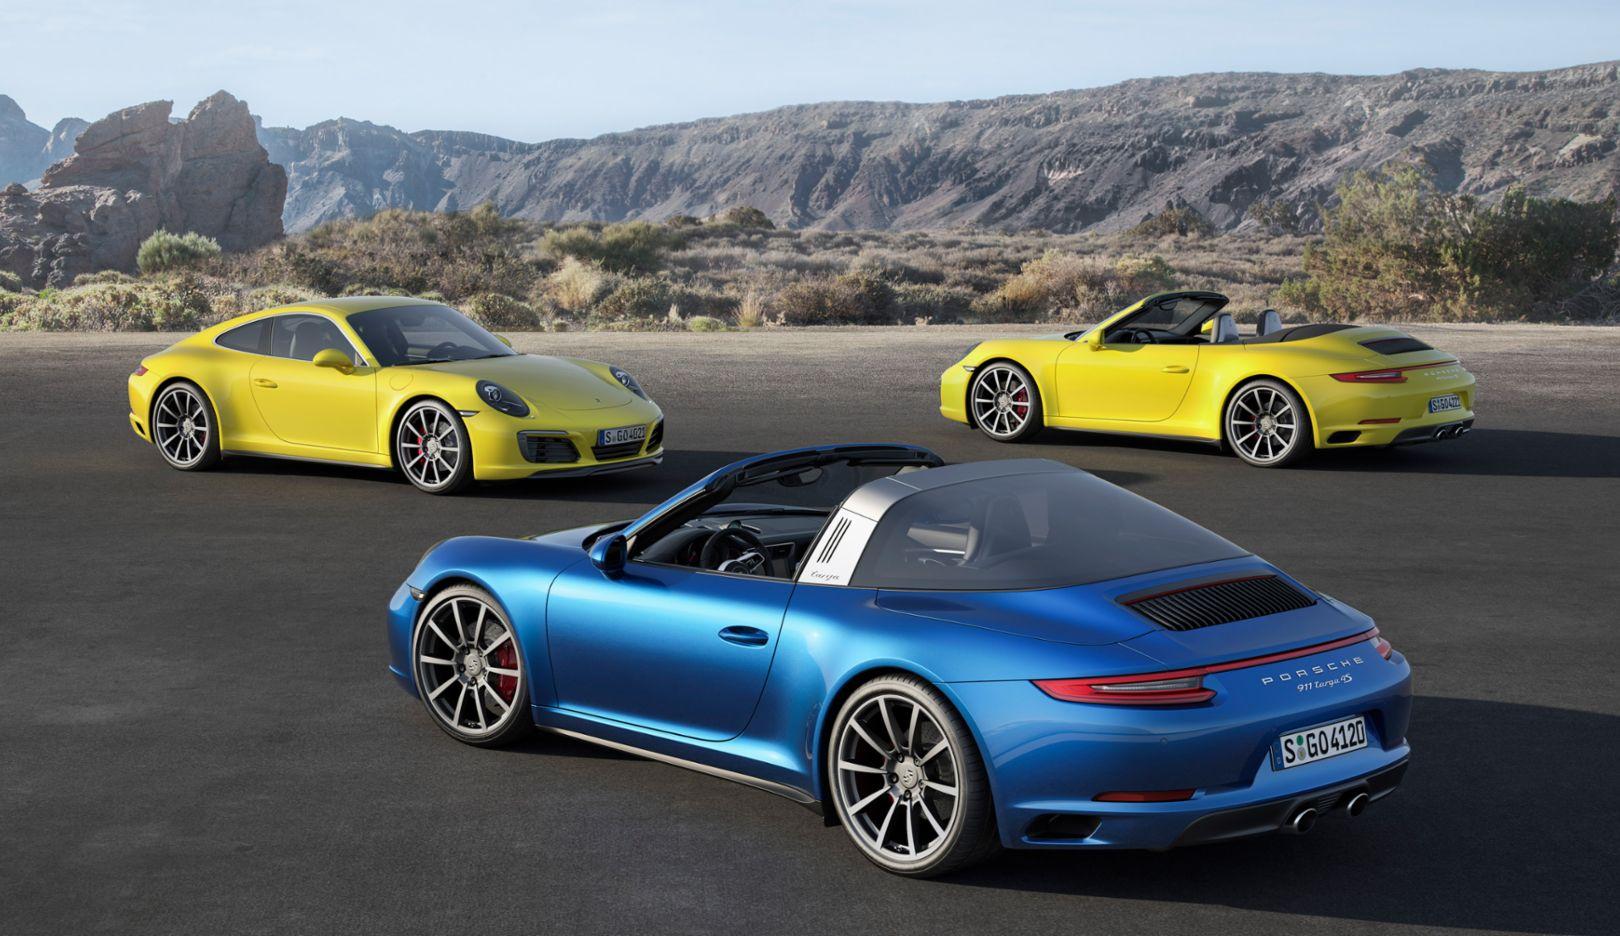 911 Carrera 4, 911 Carrera 4 Cabriolet, 911 Targa 4S, 2015, Porsche AG